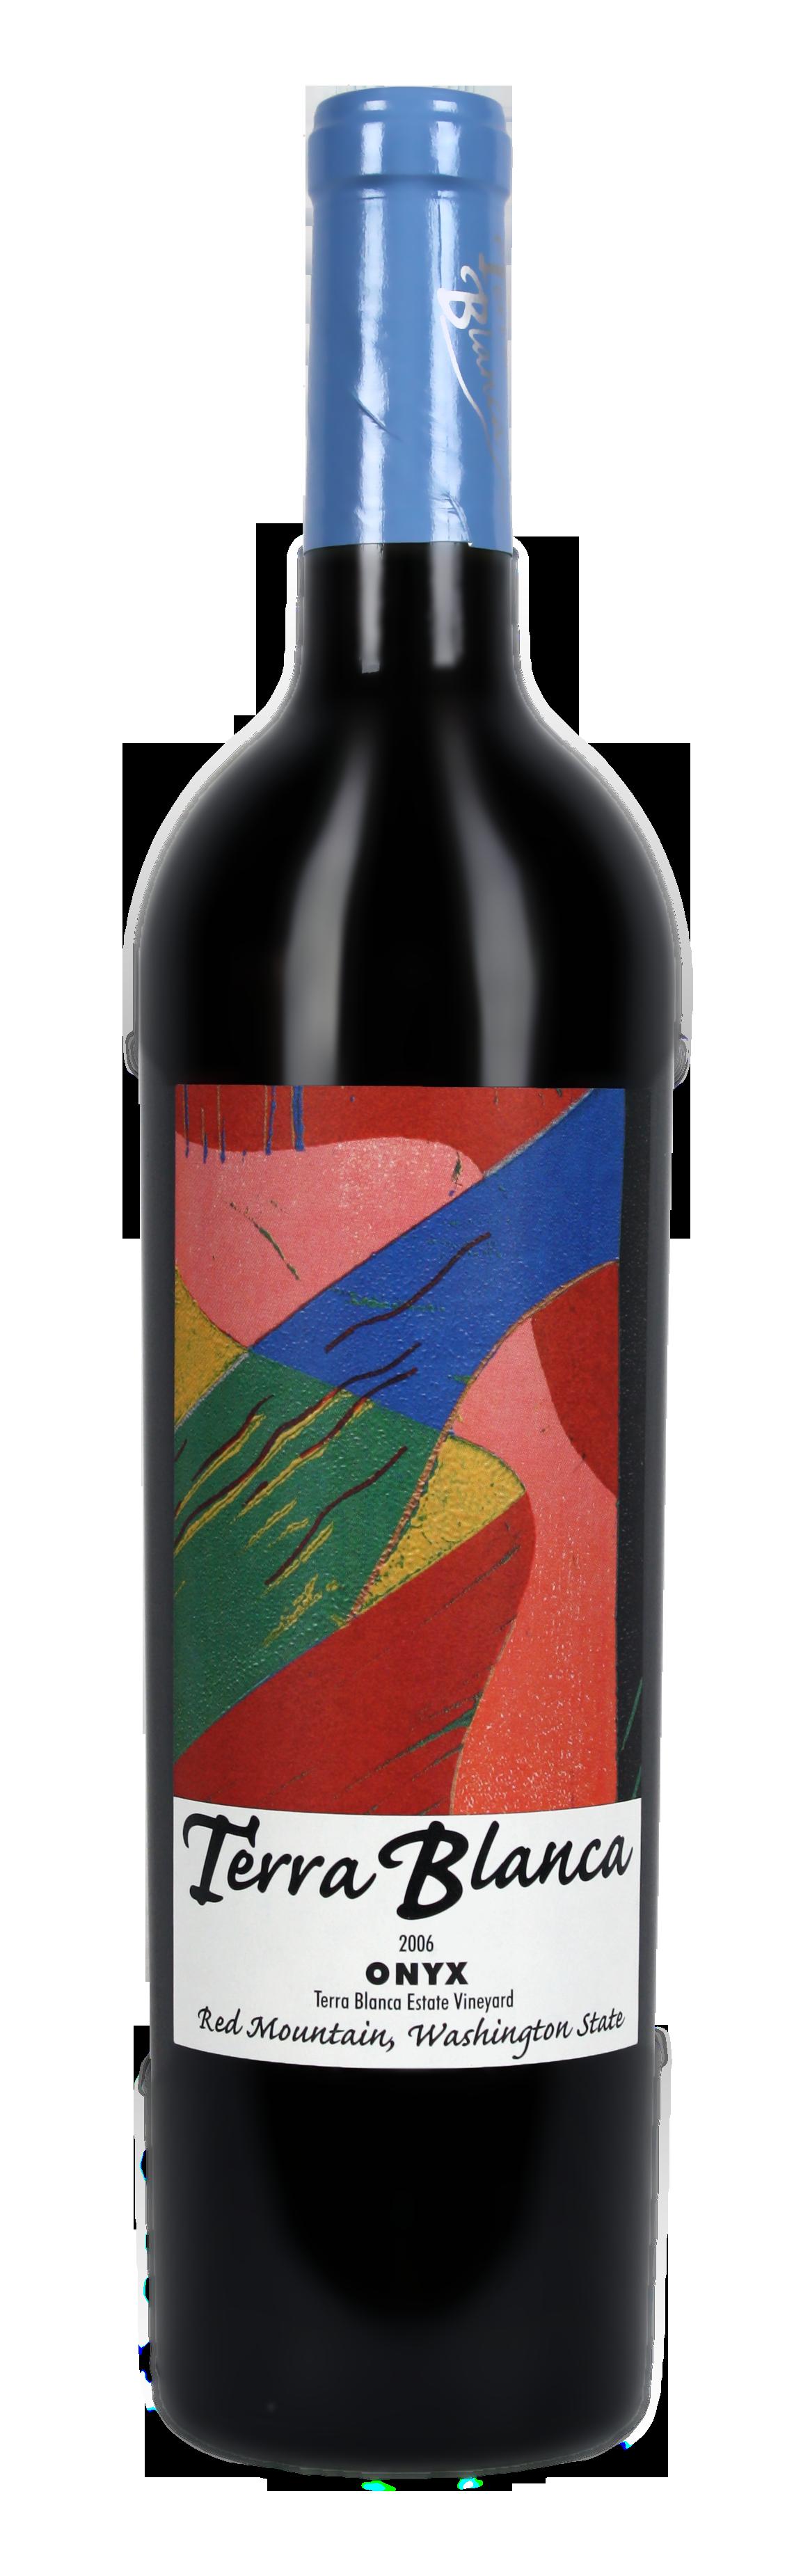 06 Onyx bottle - Terra Blanca – White Earth. Blue Skies. Red Mountain.